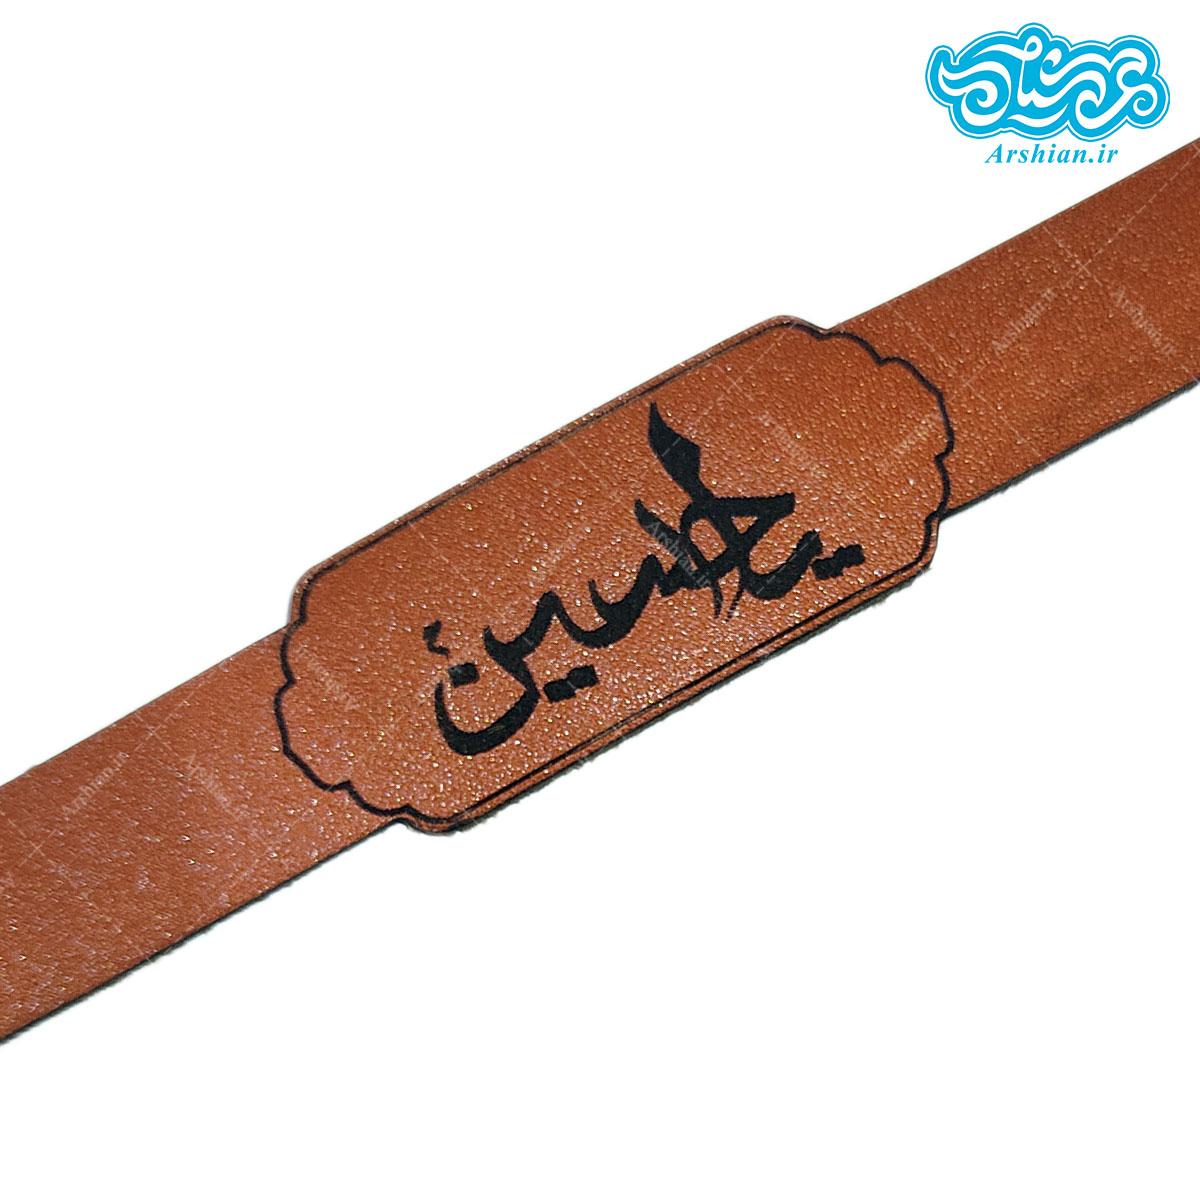 دستبند چرم باطرح یاحسین کد010